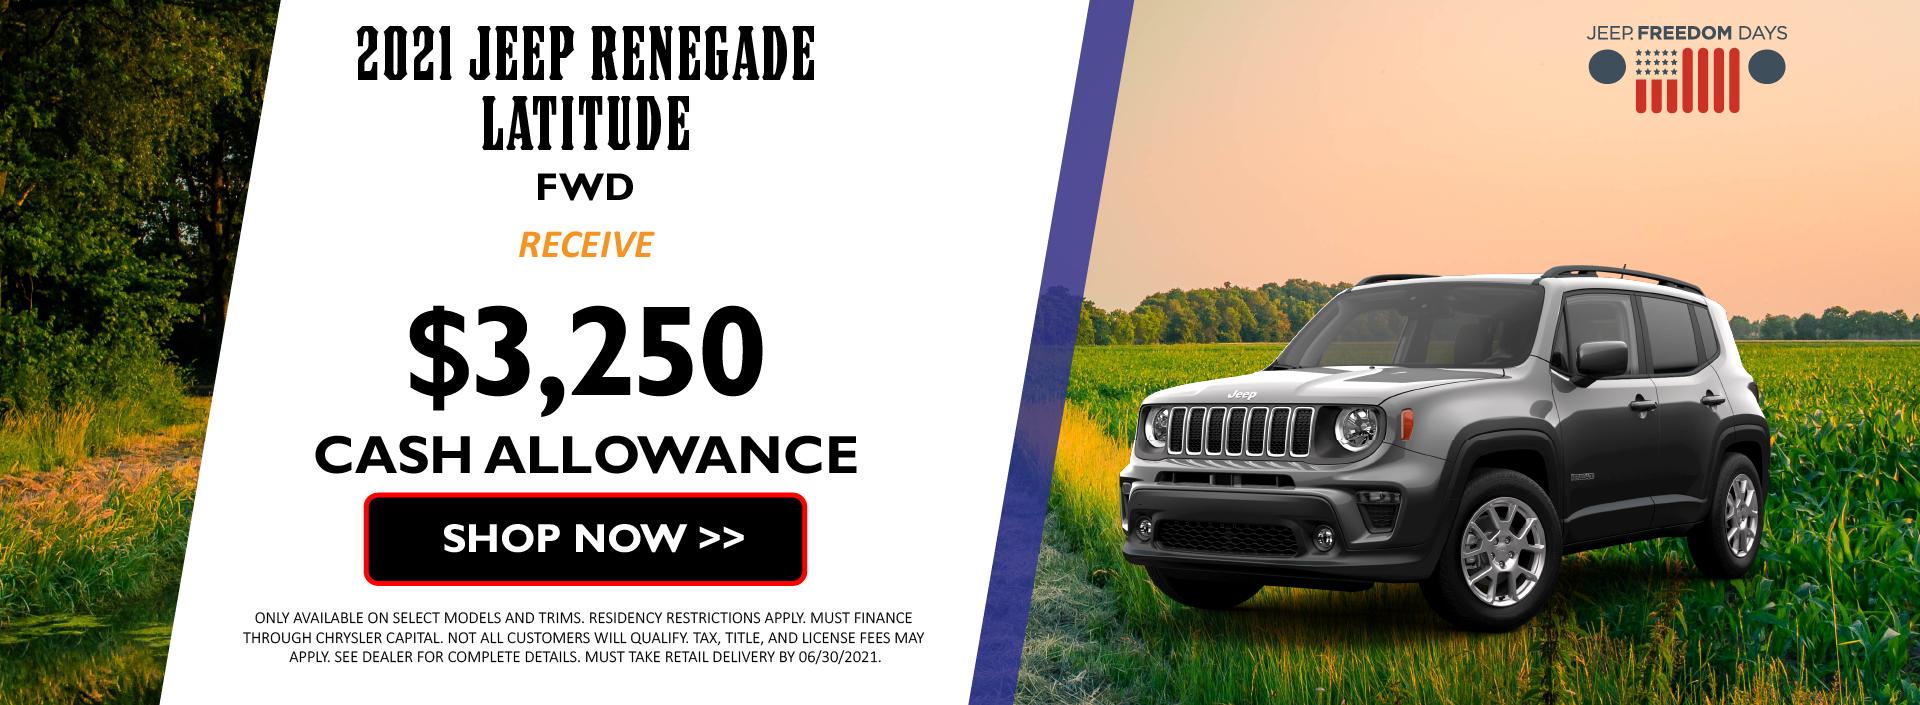 2021 Jeep Renegade June